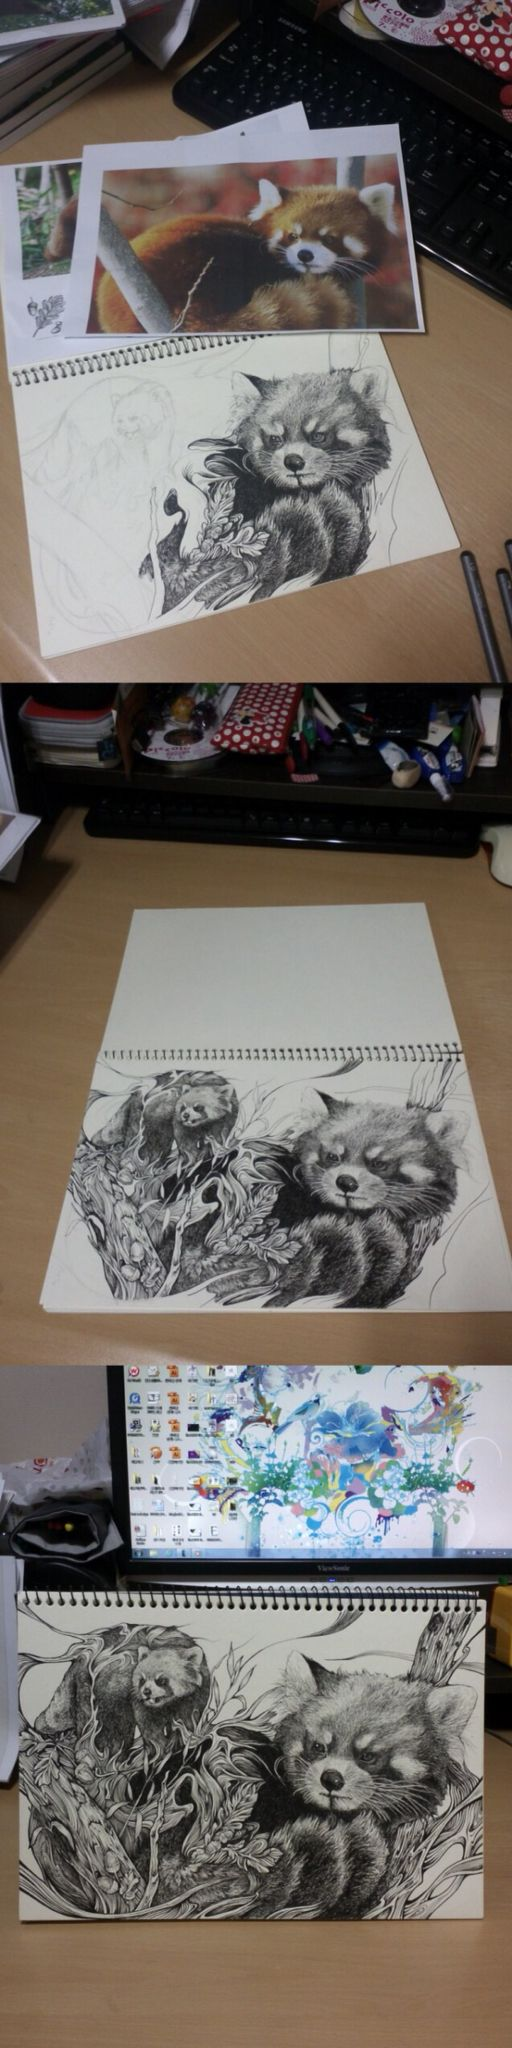 2012 SOKI 공모전 출품작06-Lesser Panda 랫서 팬더